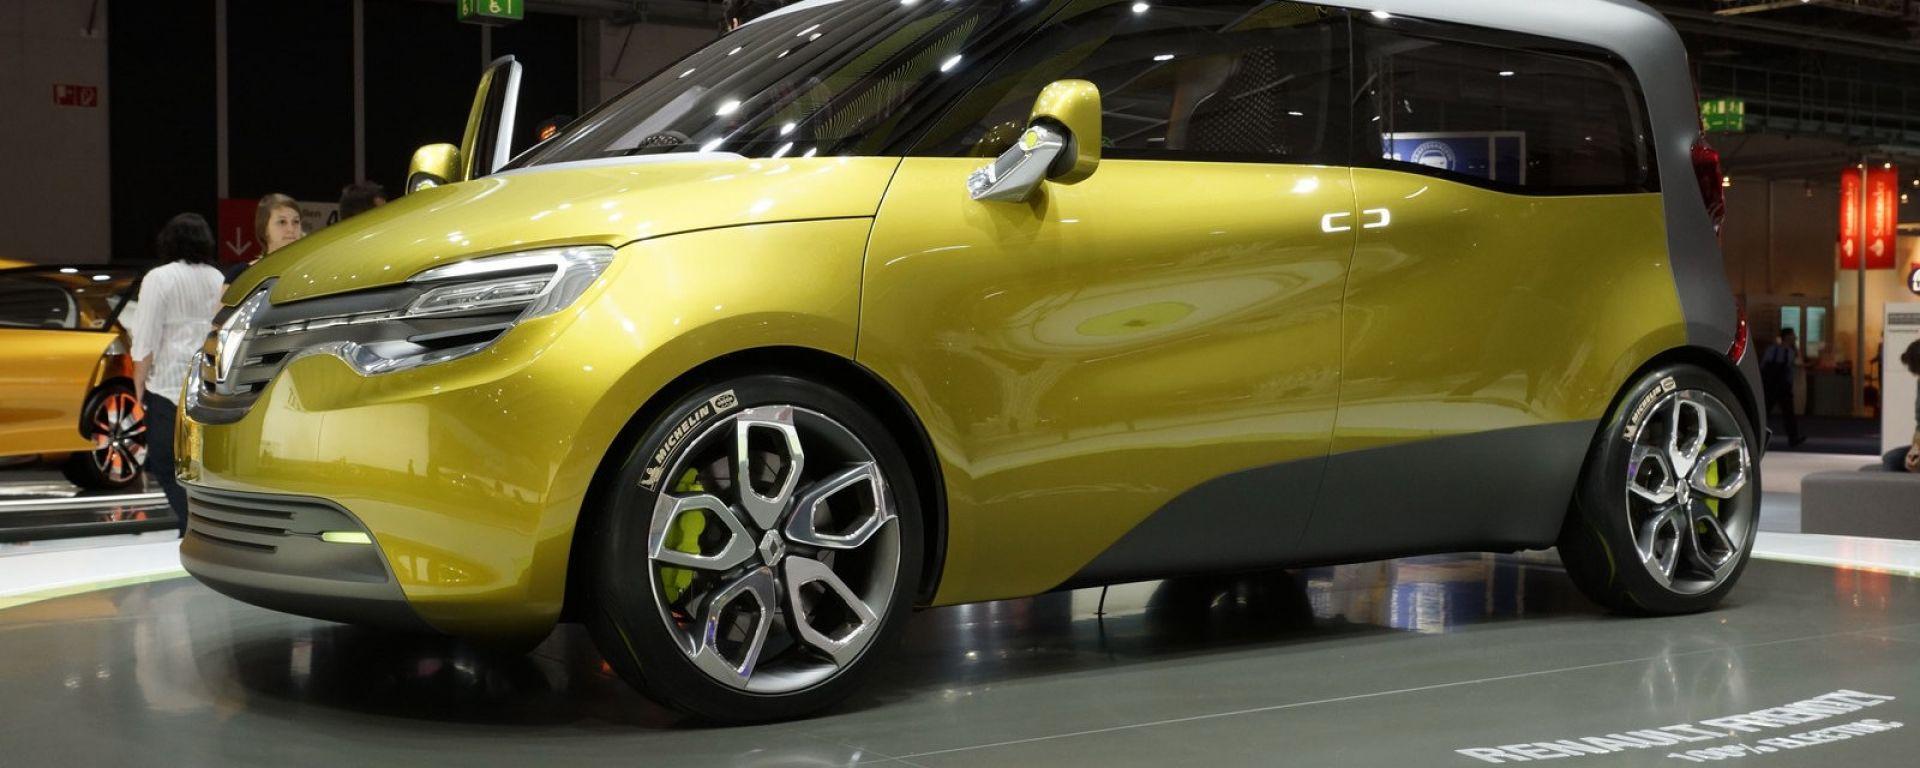 Francoforte IAA 2011: Renault